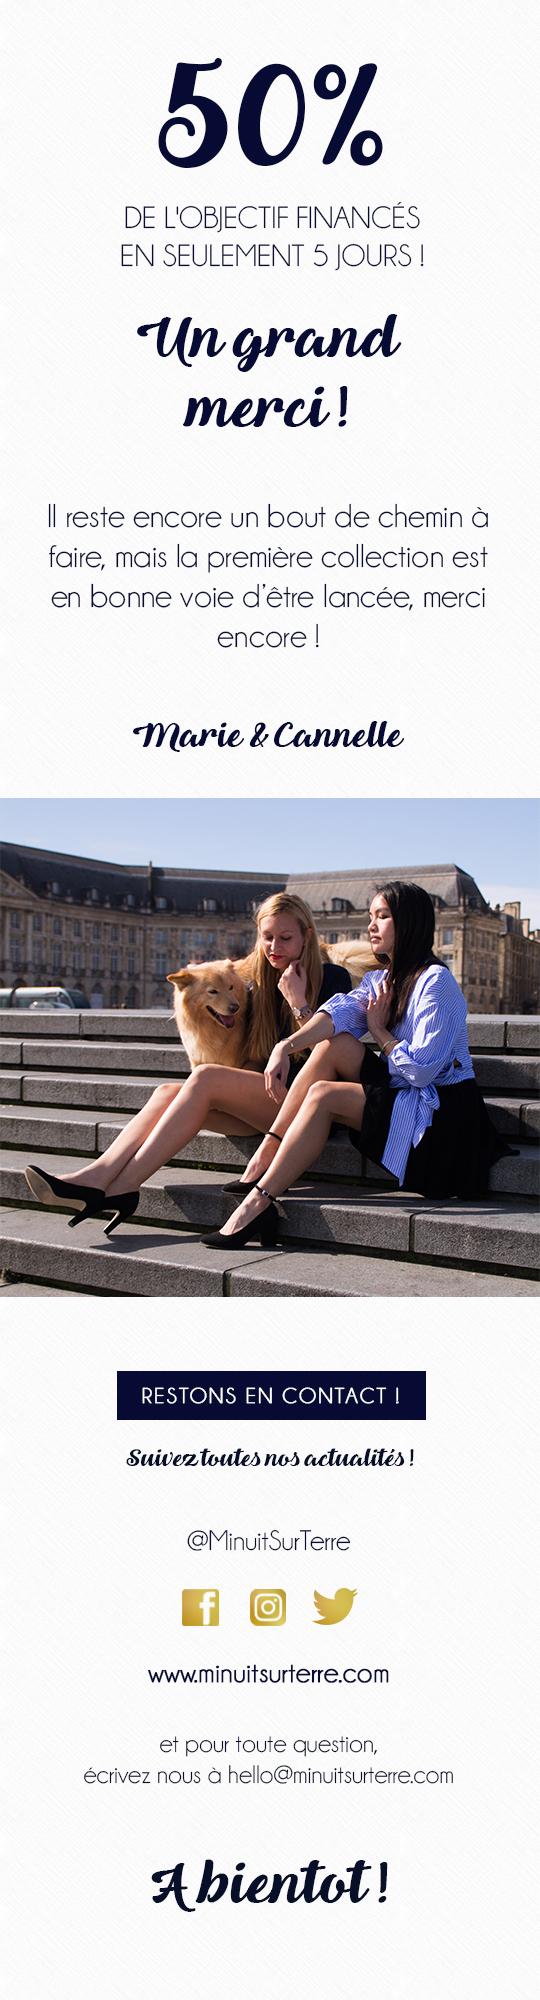 Merci_50__campagne-1489700557